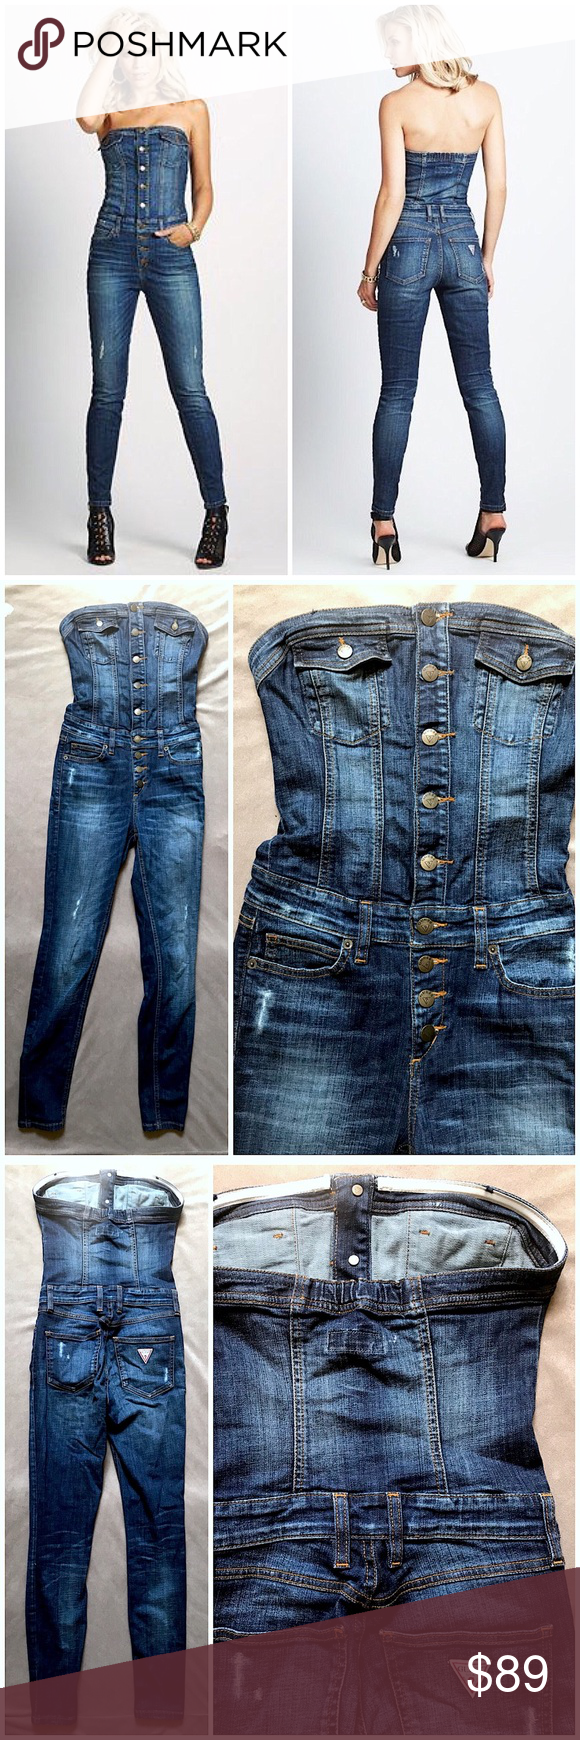 afaa26b50 Guess Jeans Dark Safari Denim Bustier Jumpsuit Guess Jeans Blue Dark Safari  Wash Denim Distressed Strapless